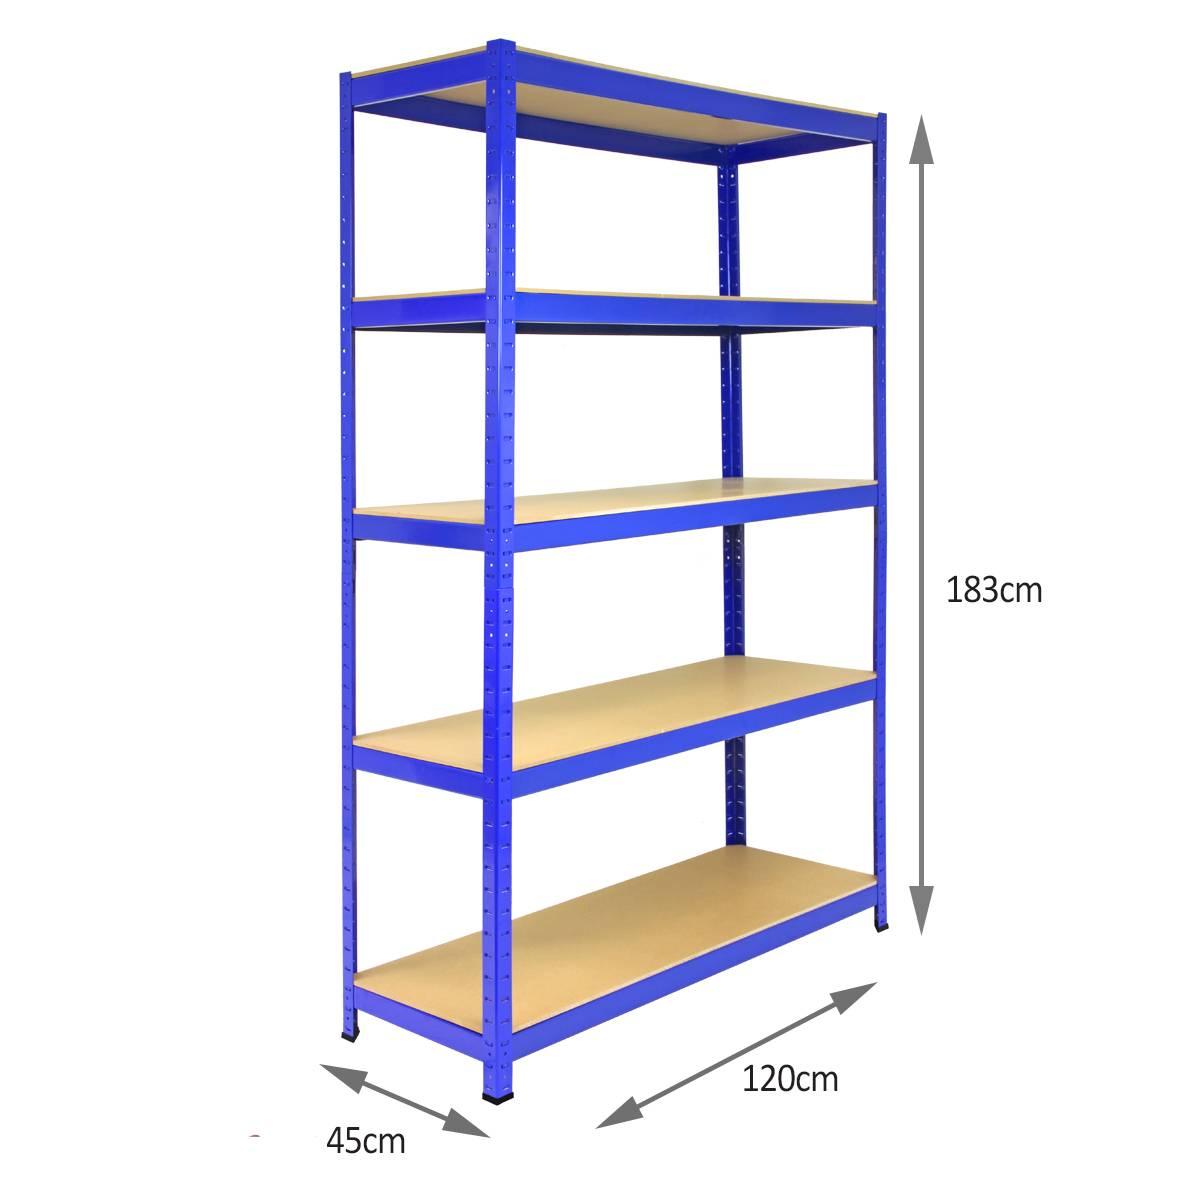 3 Bay Garage Racking Shelves Shed Greenhouse Shelving 5